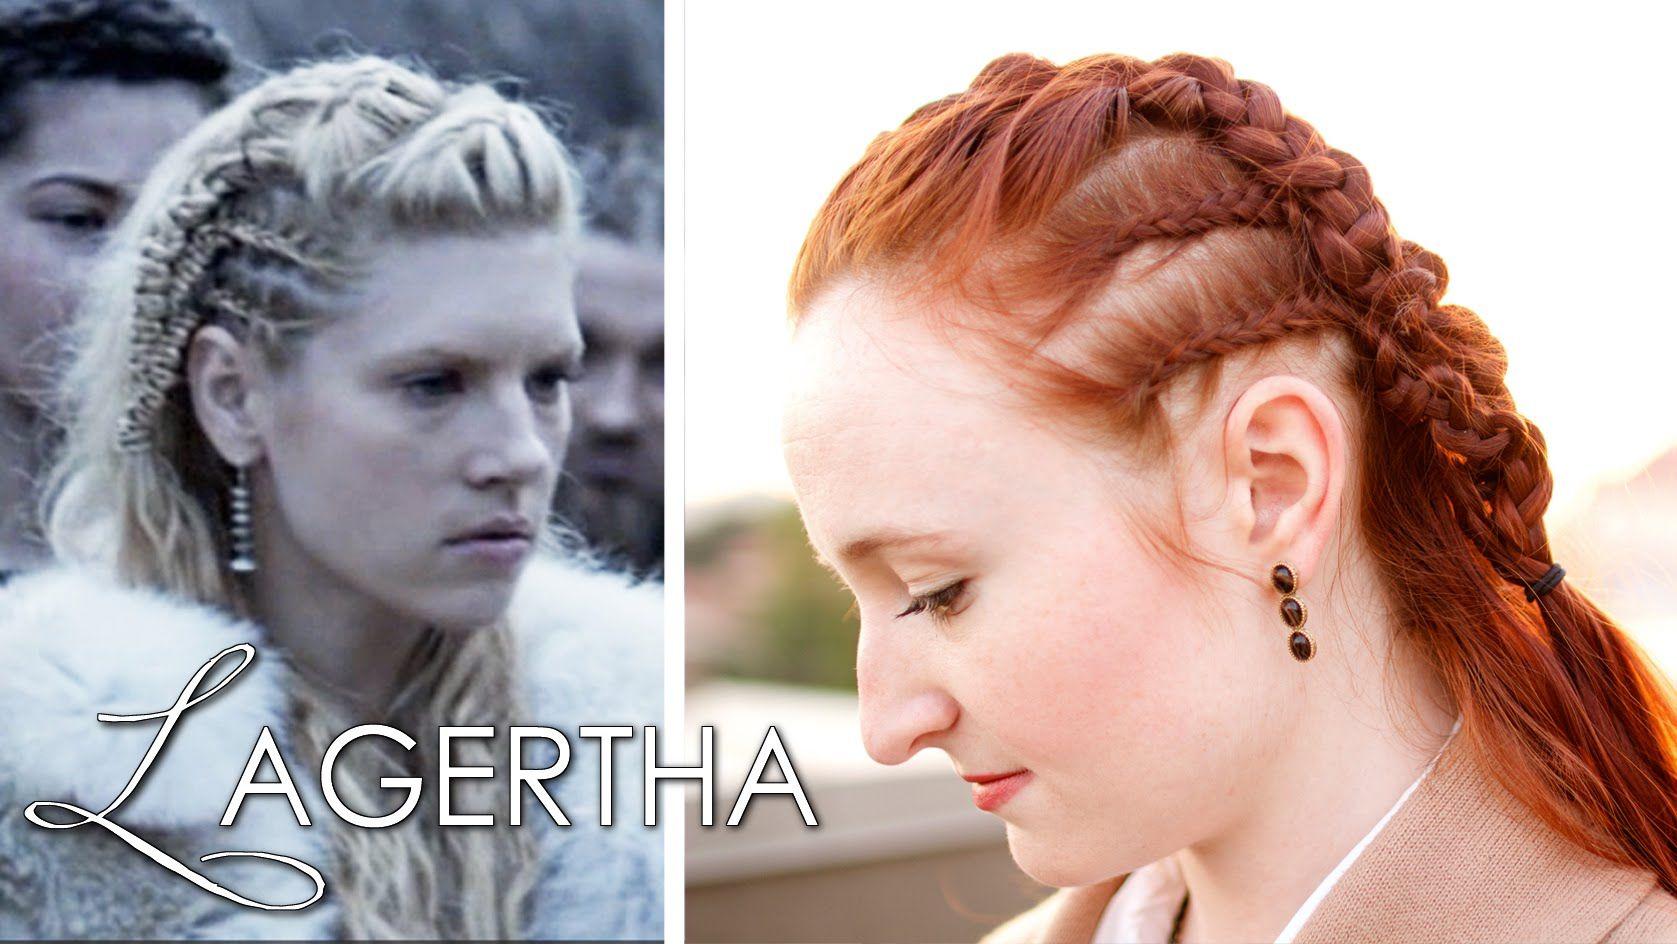 Lagertha S Earl Braids Silvousplaits Hairstyling Viking Hair Hair Tutorial Hair Styles